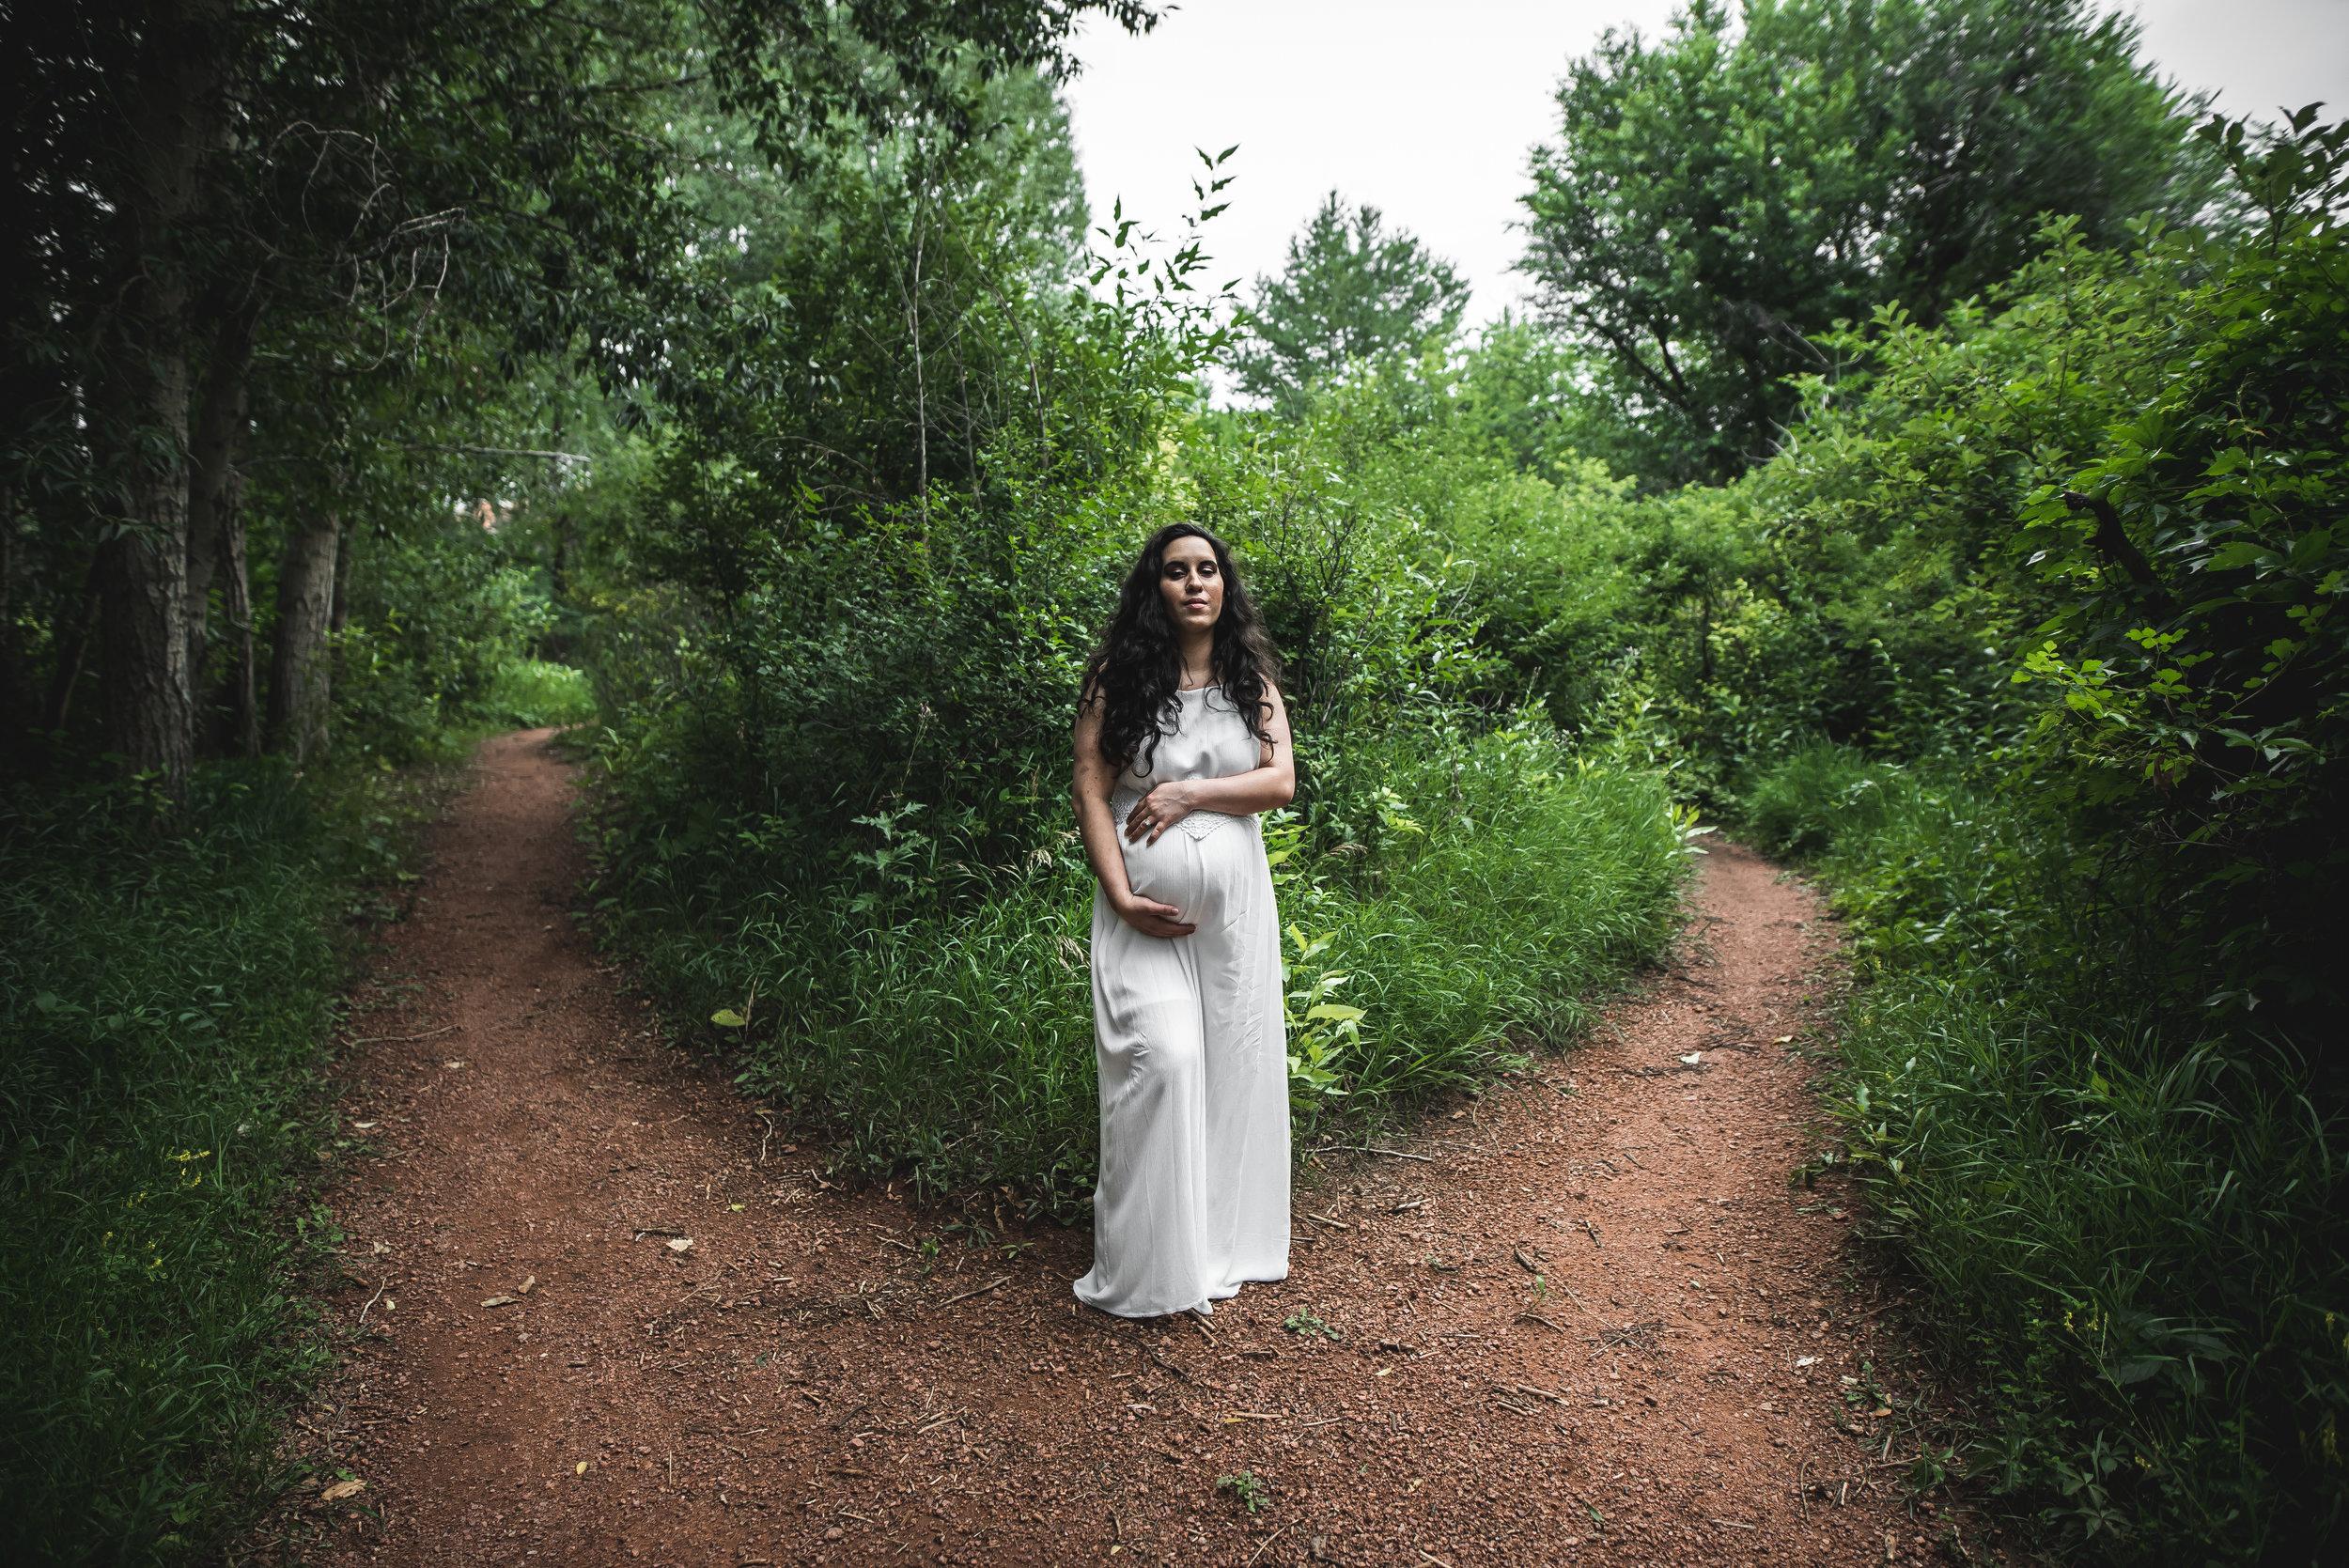 Colorado Springs Maternity Photography